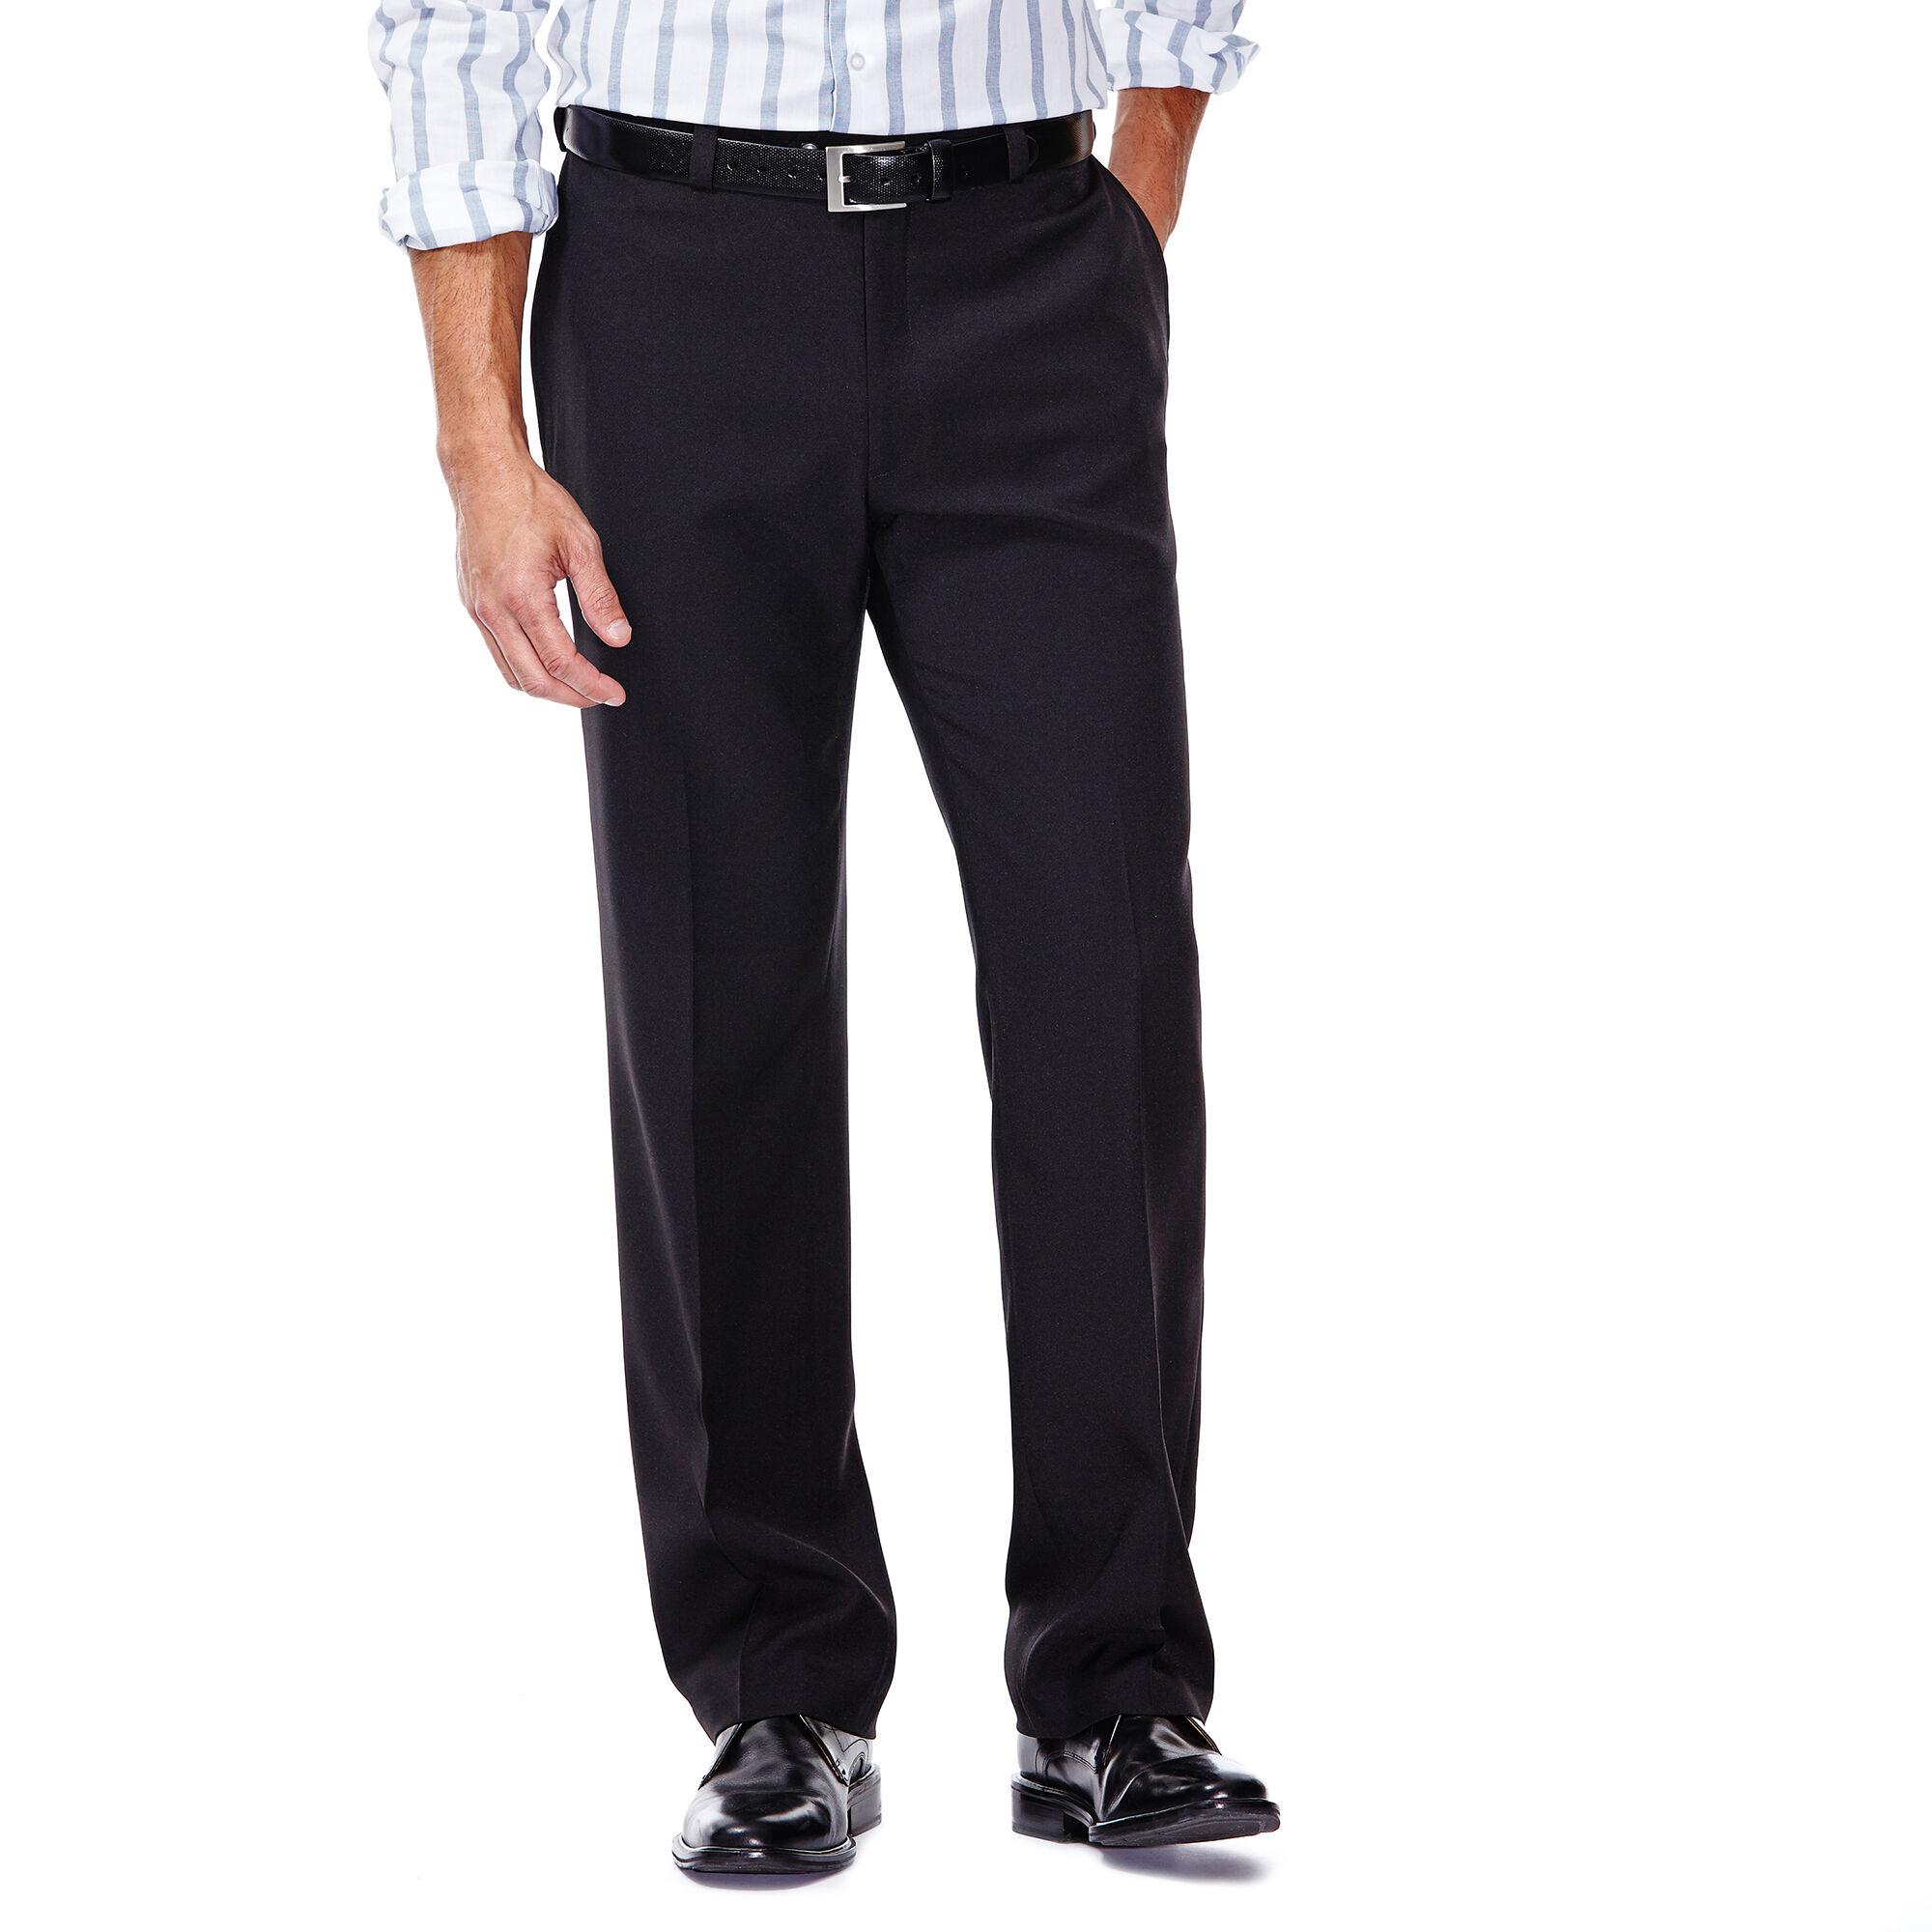 Mens black beltless dress pants